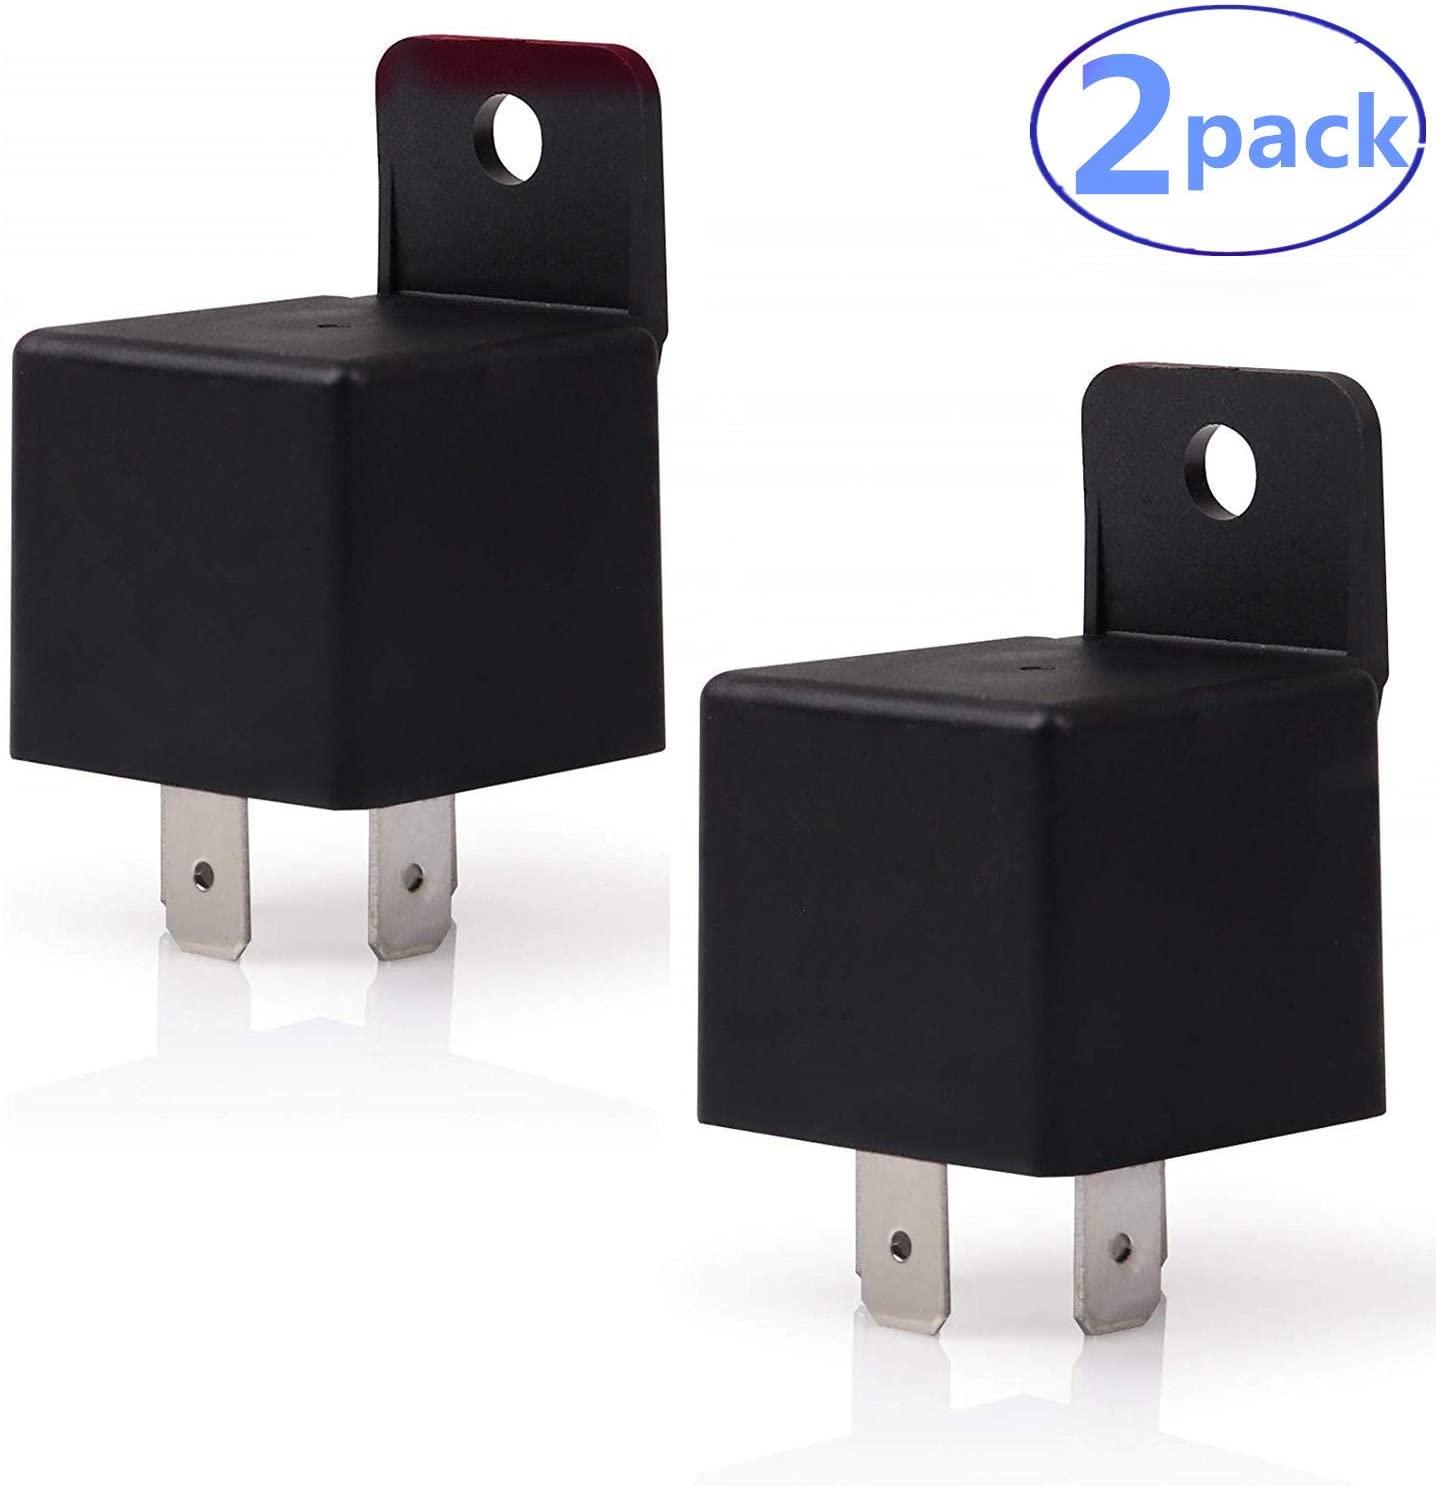 SoundOriginal Car Hron Relay 4 Pin 12v 40amp Spst Model No JD1912 12VDC 40A 14VDC Auto Switches & Starters, 2 Pack